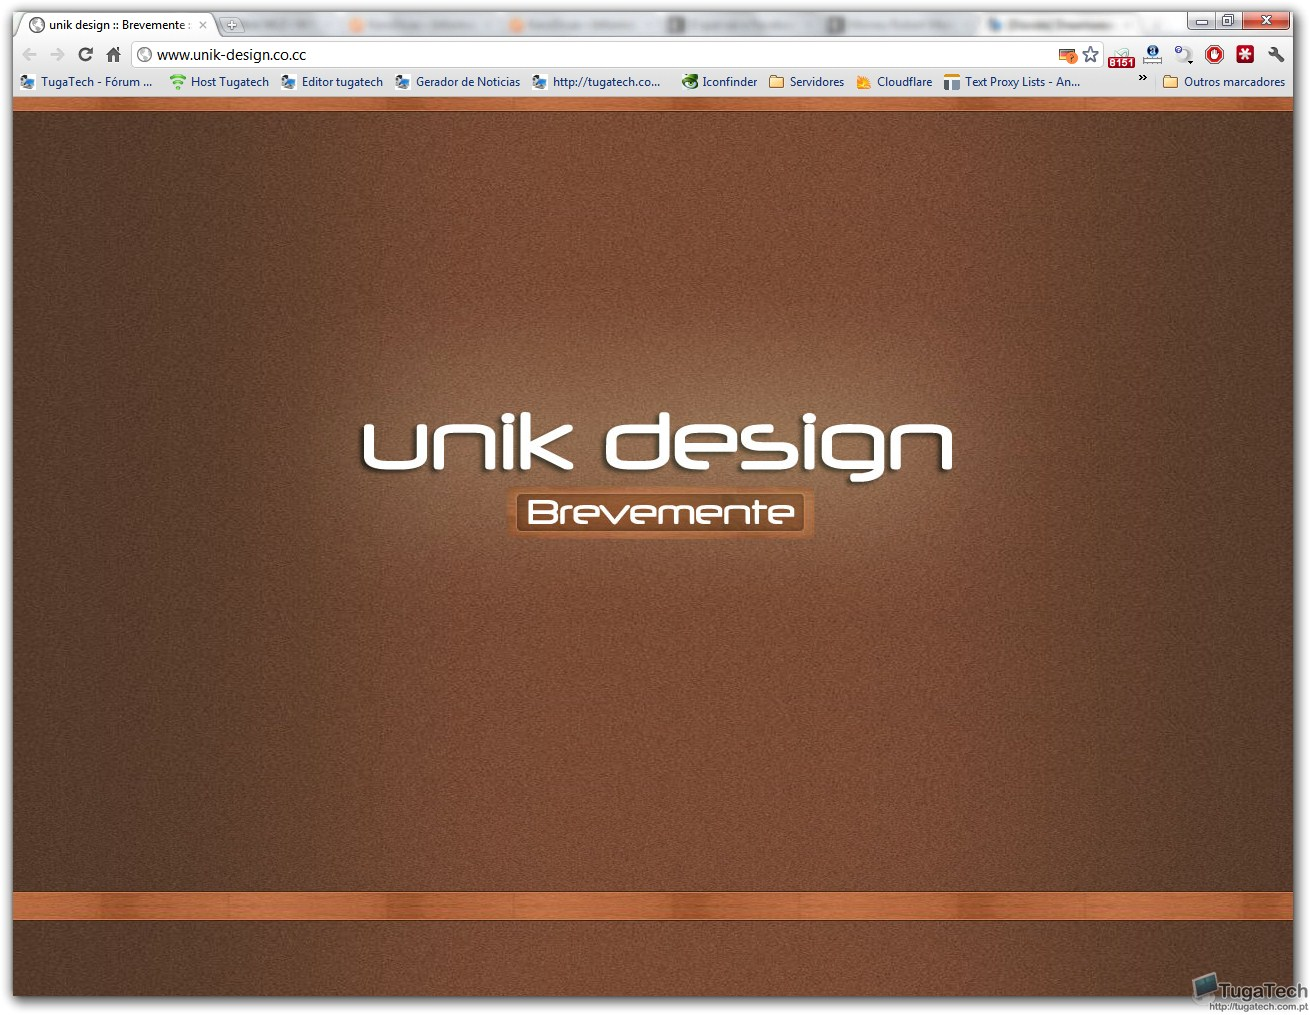 [Dúvida] Dreamweaver Unik_design_Brevemente_-_Google_Chrome-2011-07-01_20.51.25